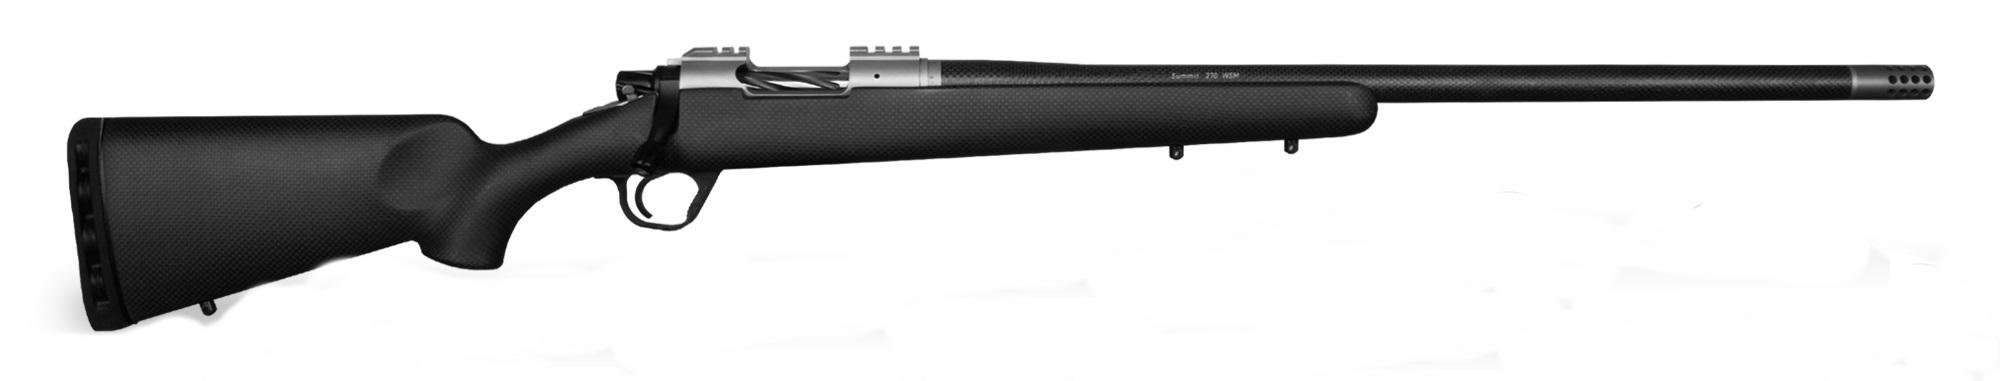 Christensen Arms SUMMIT TI 6.5 PRC